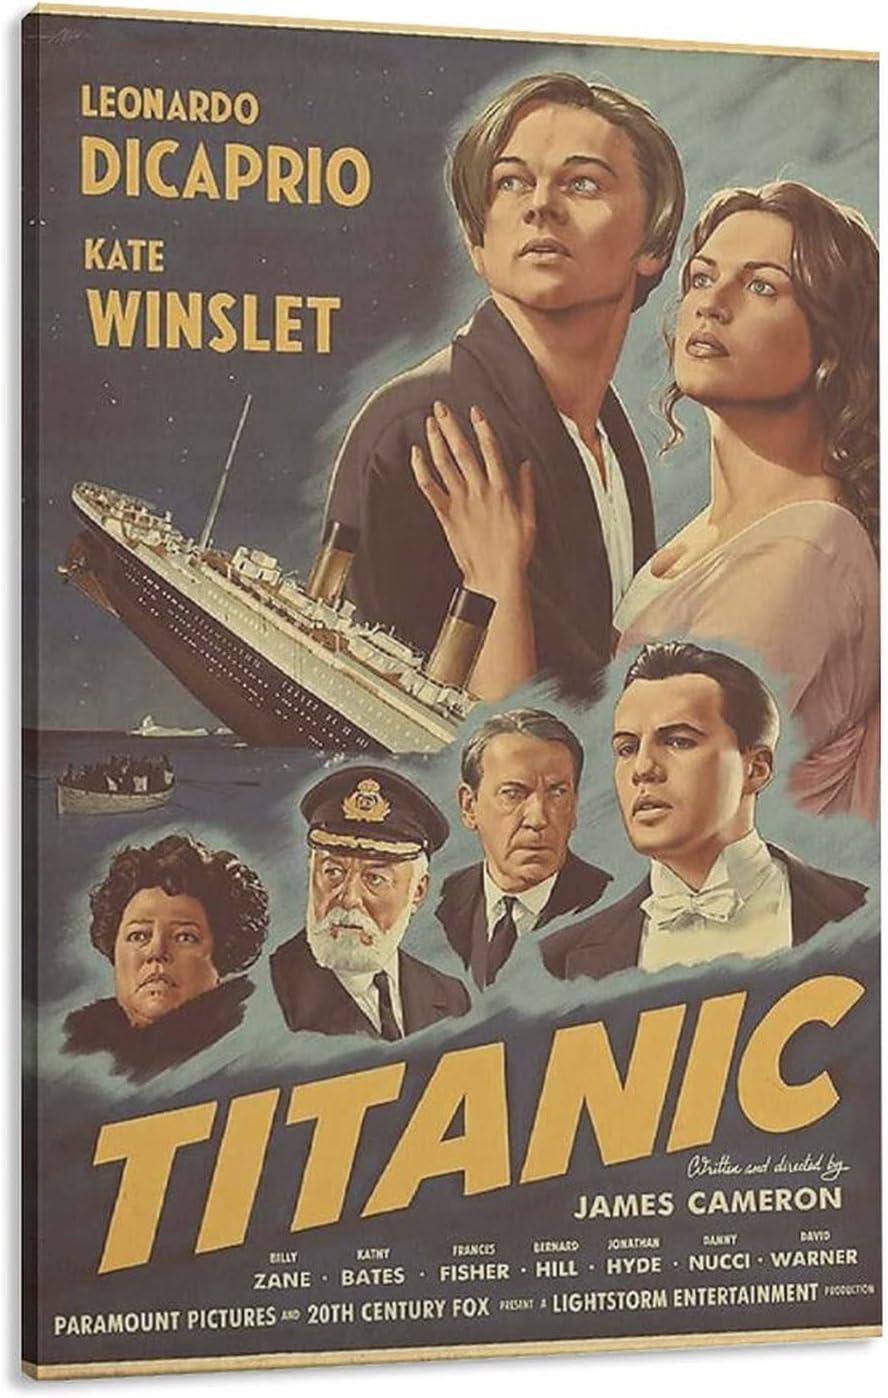 Titanic Overseas parallel import regular item 1997 Film Canvas Poster Sports Decor Bedroom Landscape Beauty products